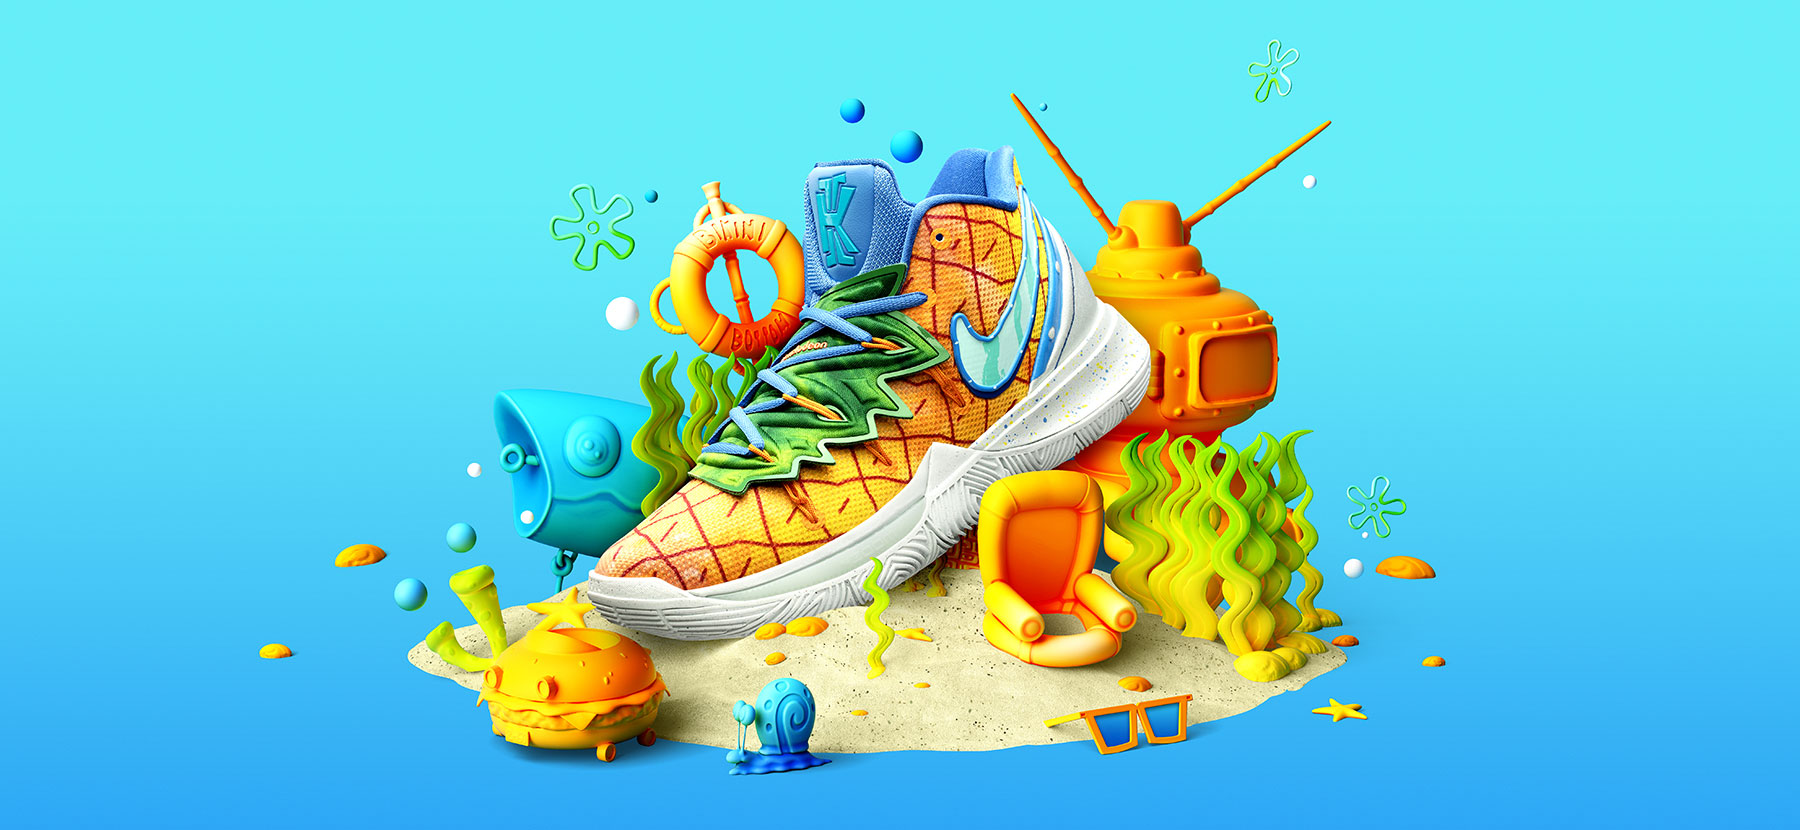 SpongeBob Nike Kyrie Pineapple Clothing